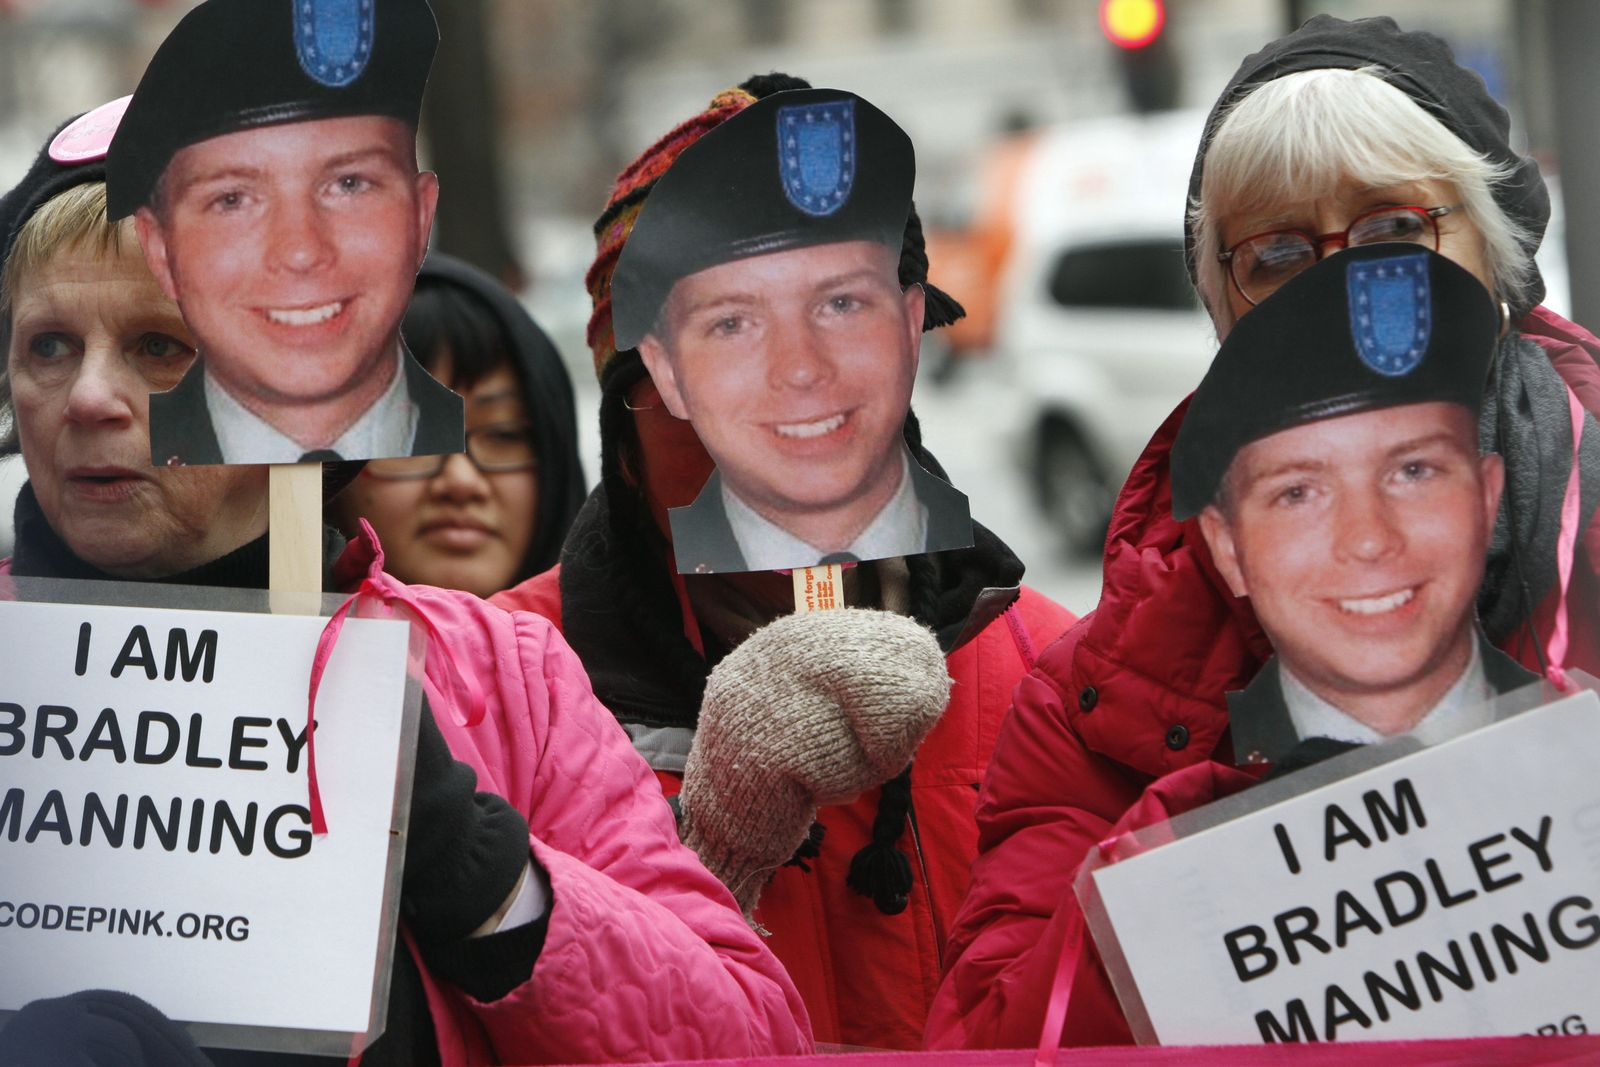 SP 29/2011 p81 SPIN Bradley Manning Protest